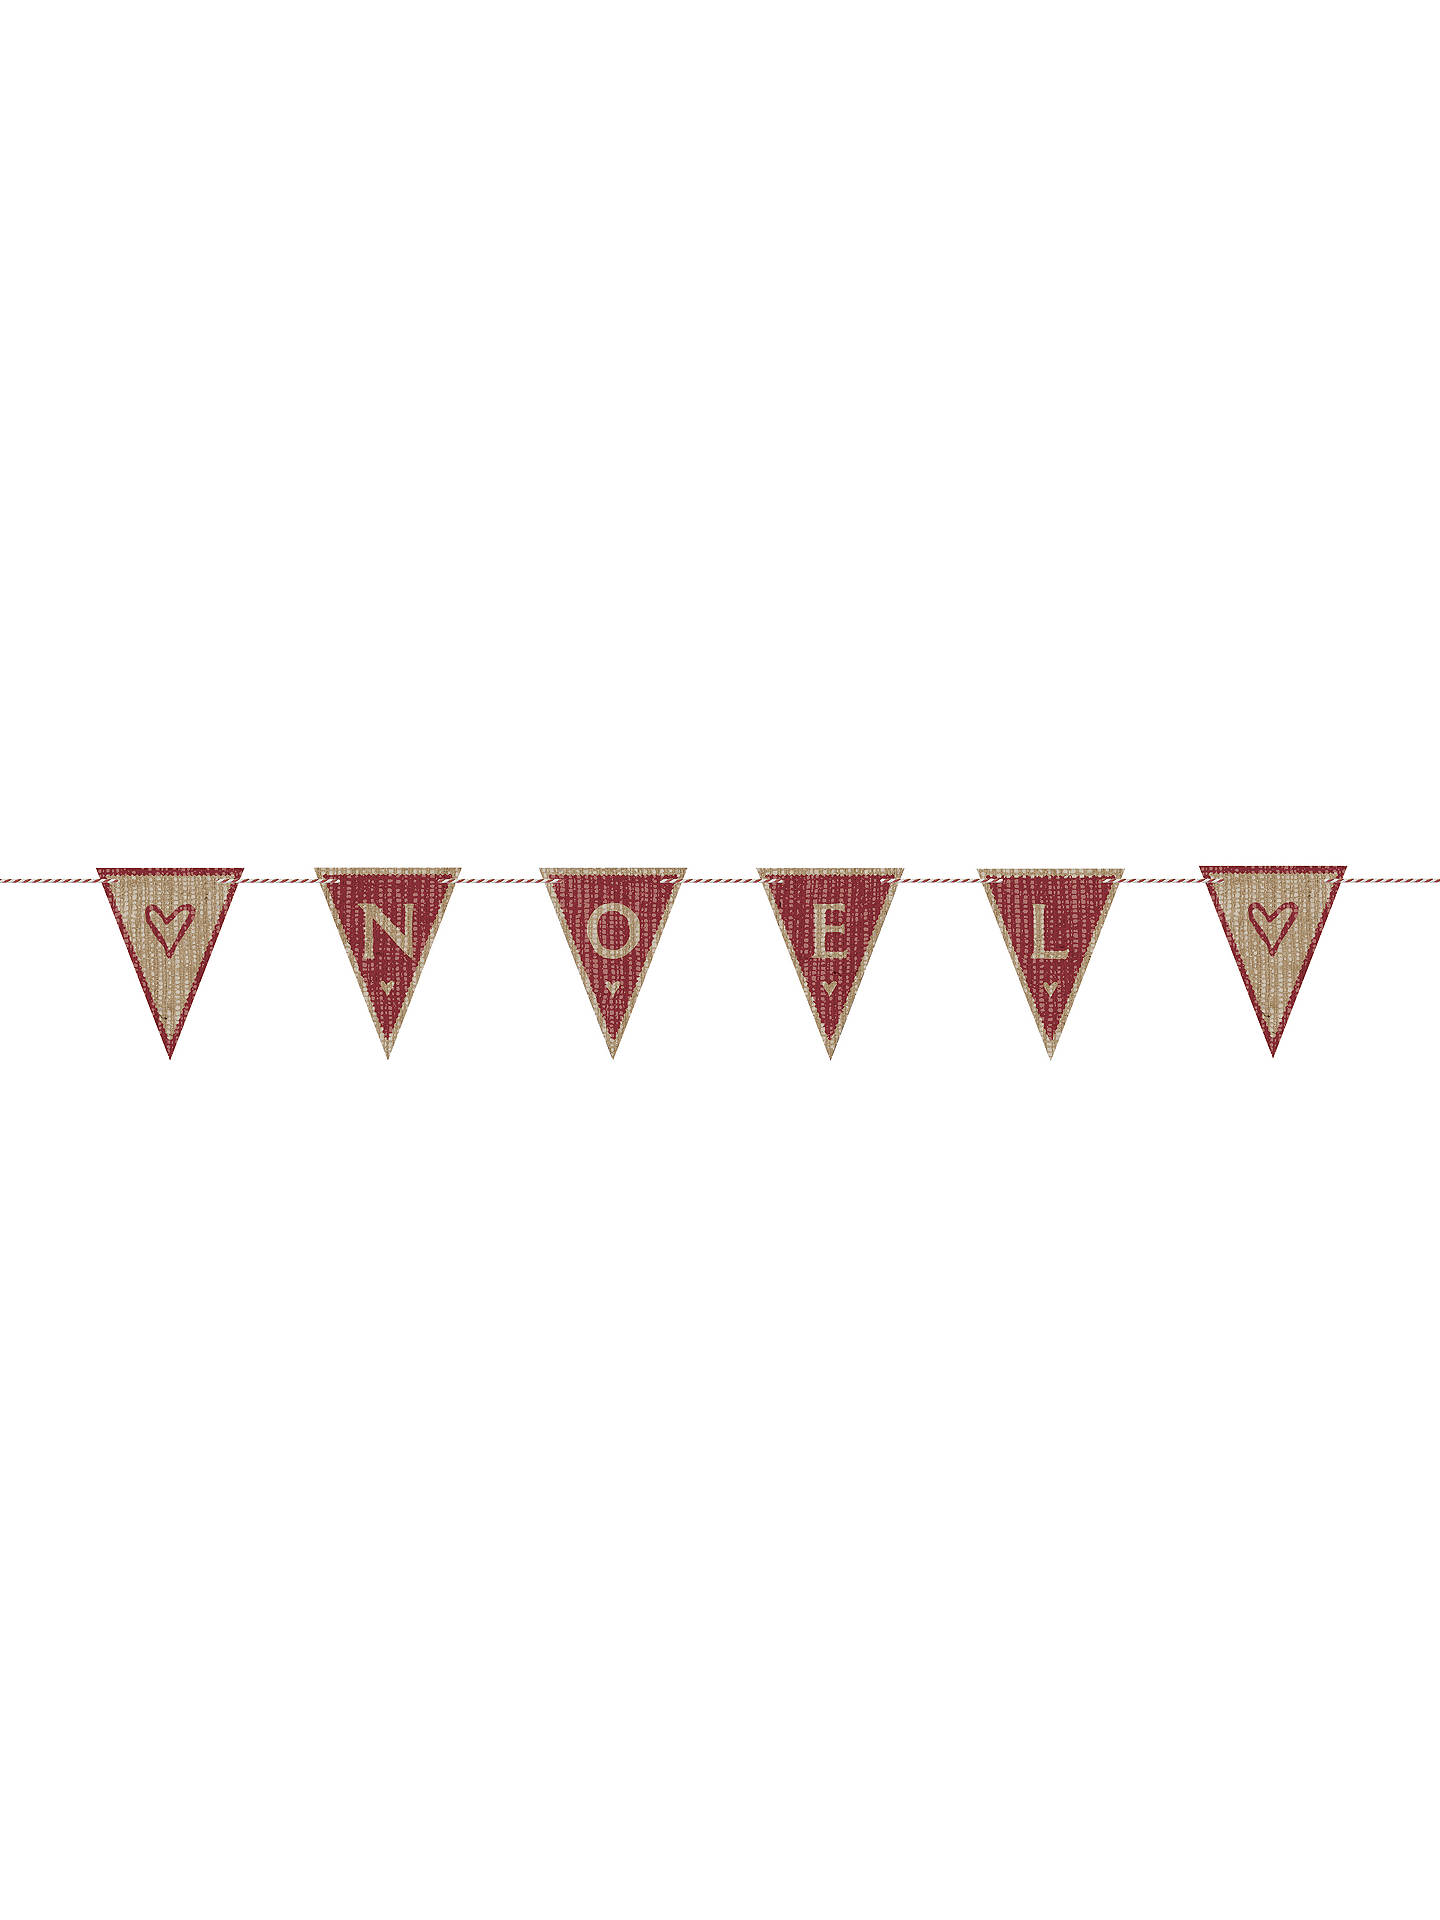 East of India Noel Fabric Bunting Kit, Brown/Red at John Lewis ...